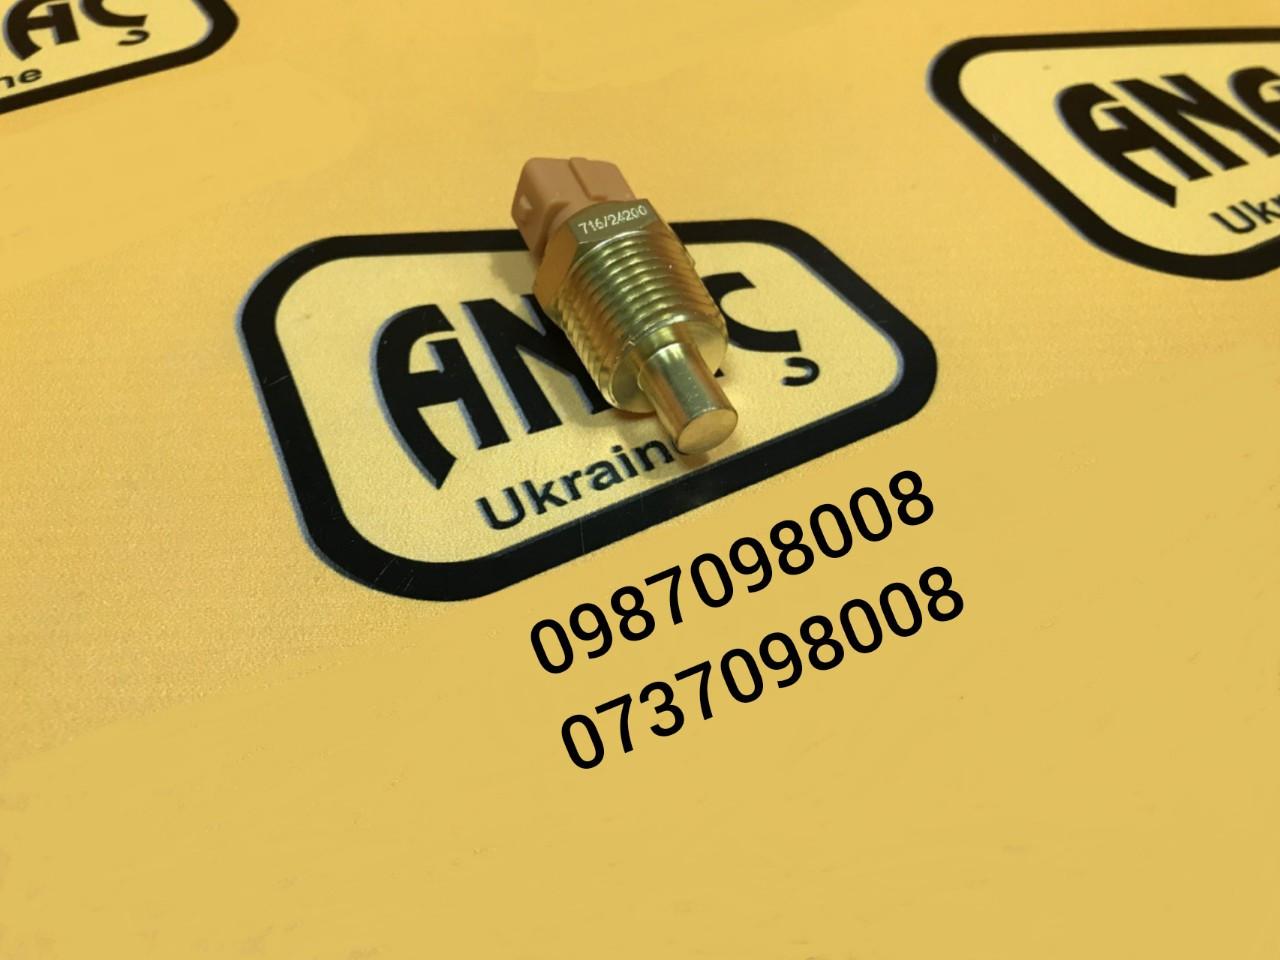 Датчик температуры для двигателя  на JCB 3CX/4CX номер : 716/24200, 701/56600